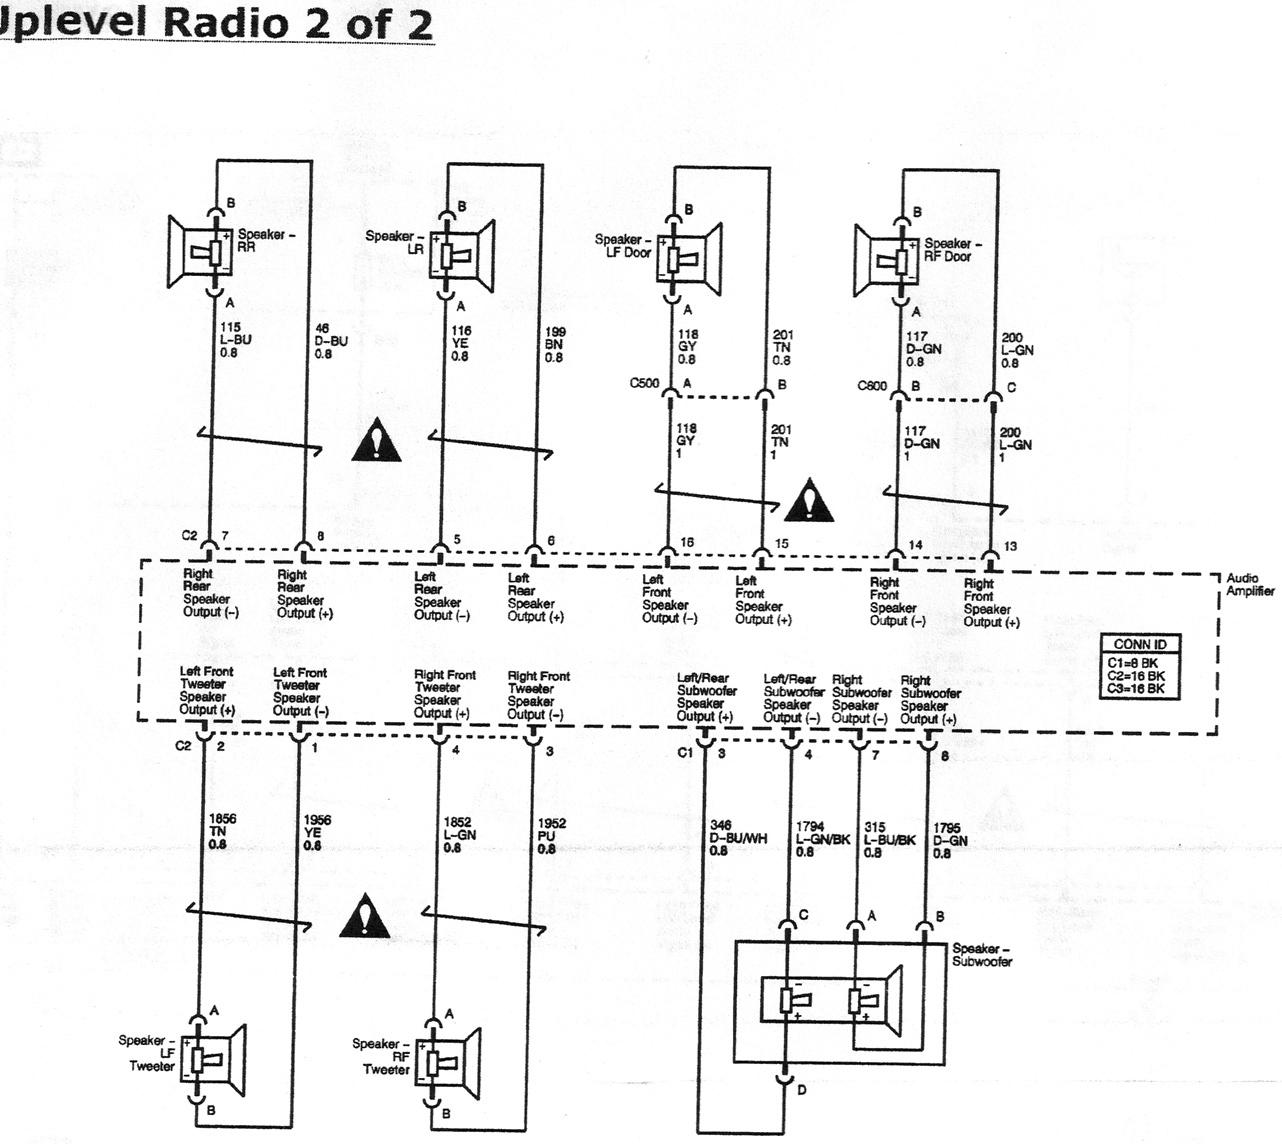 Monsoon Amp Wiring Diagram -Car Factory Radio Wiring Diagram | Begeboy Wiring  Diagram SourceBegeboy Wiring Diagram Source